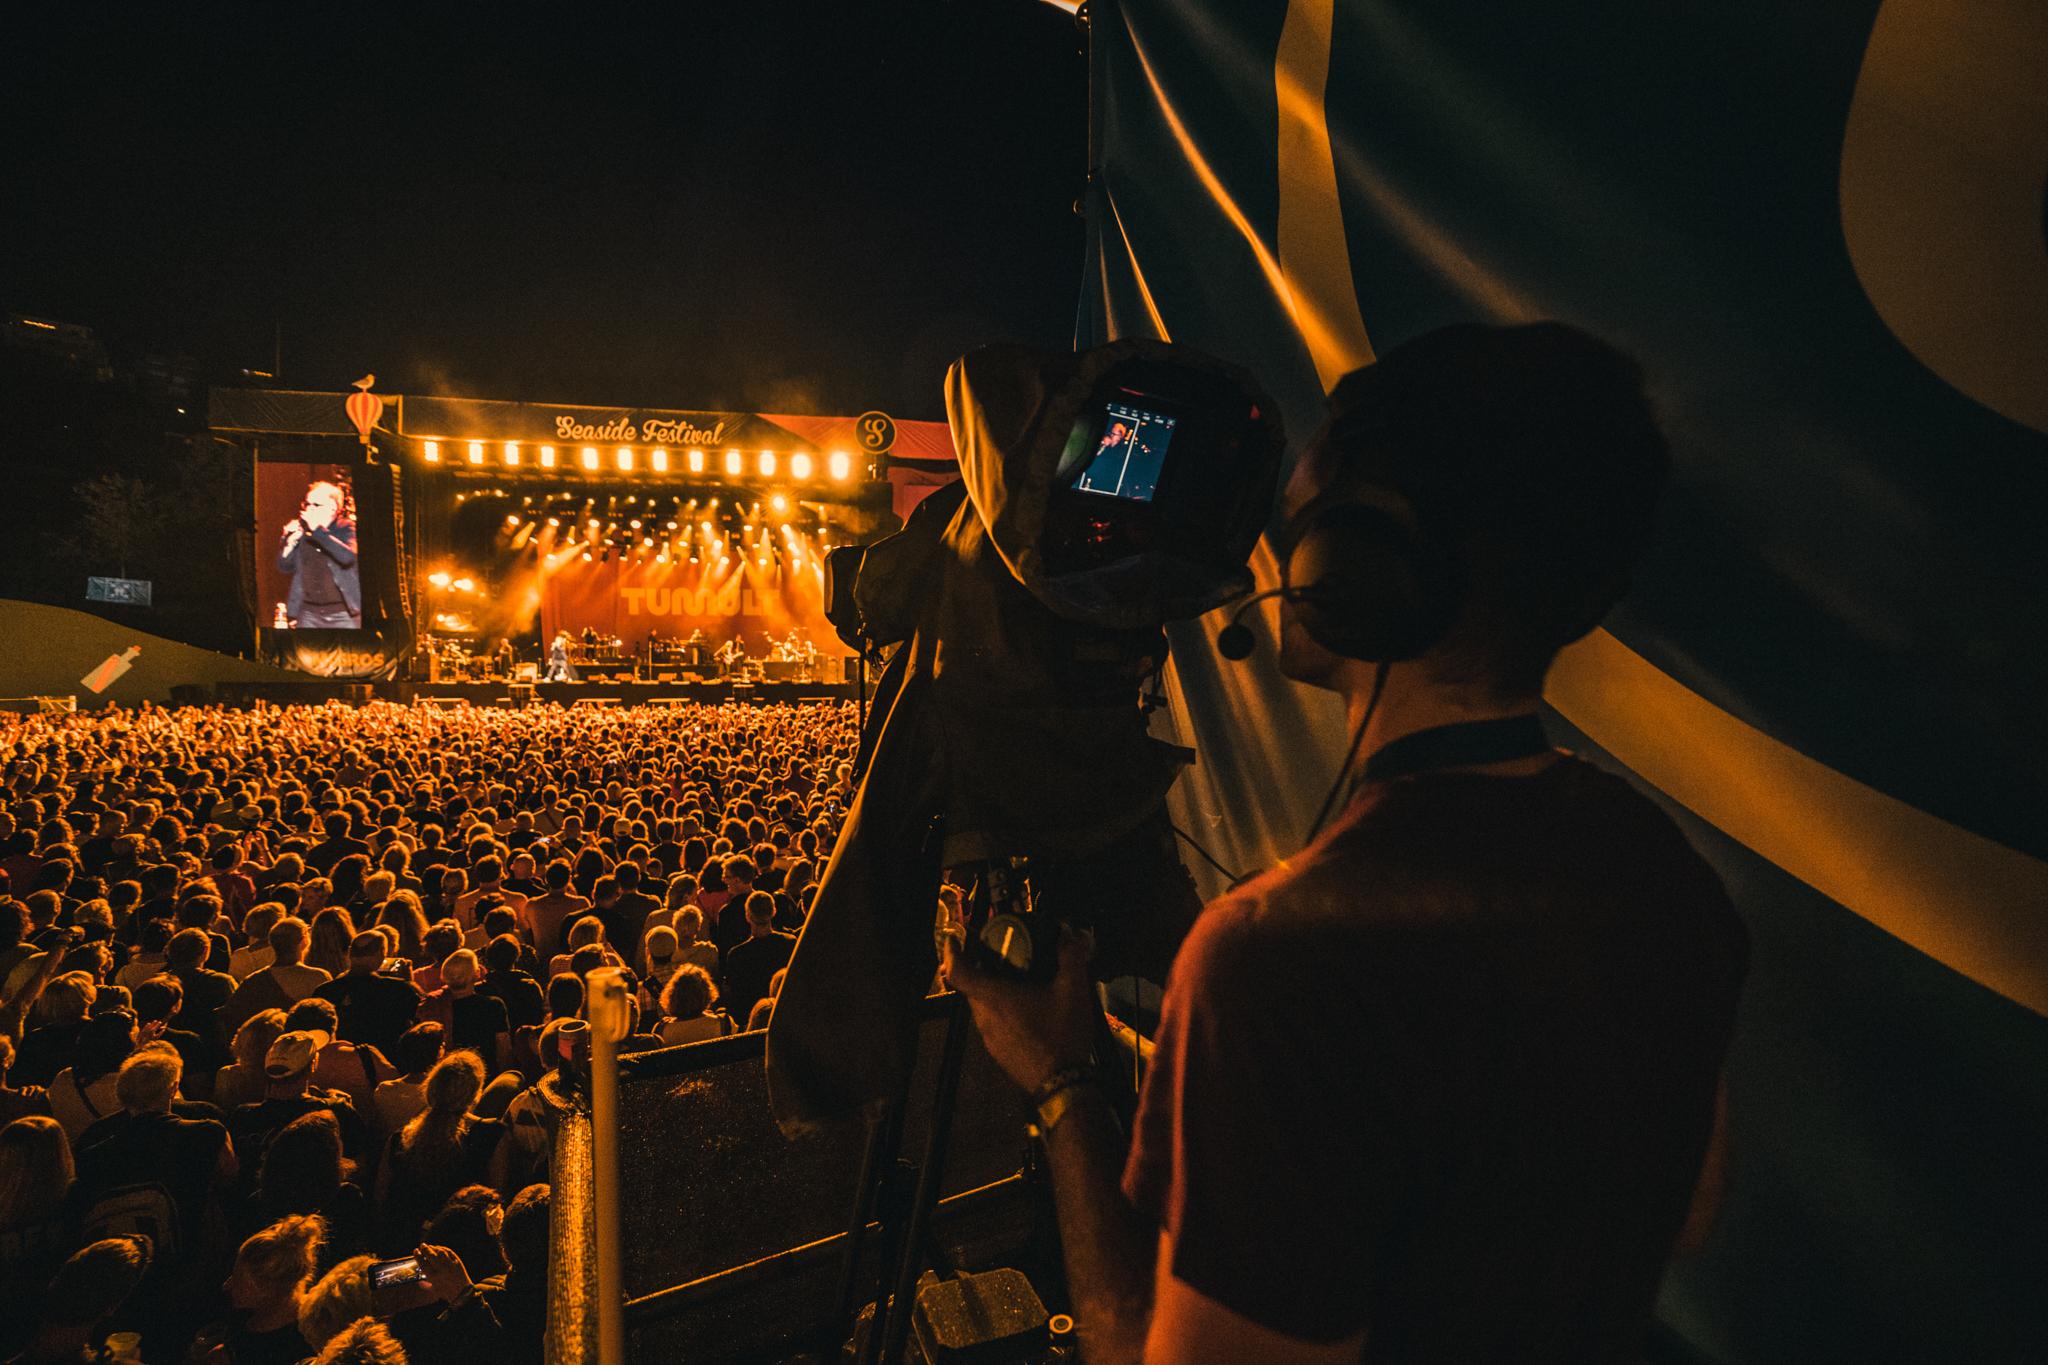 Festival Livebild von Bildsektor